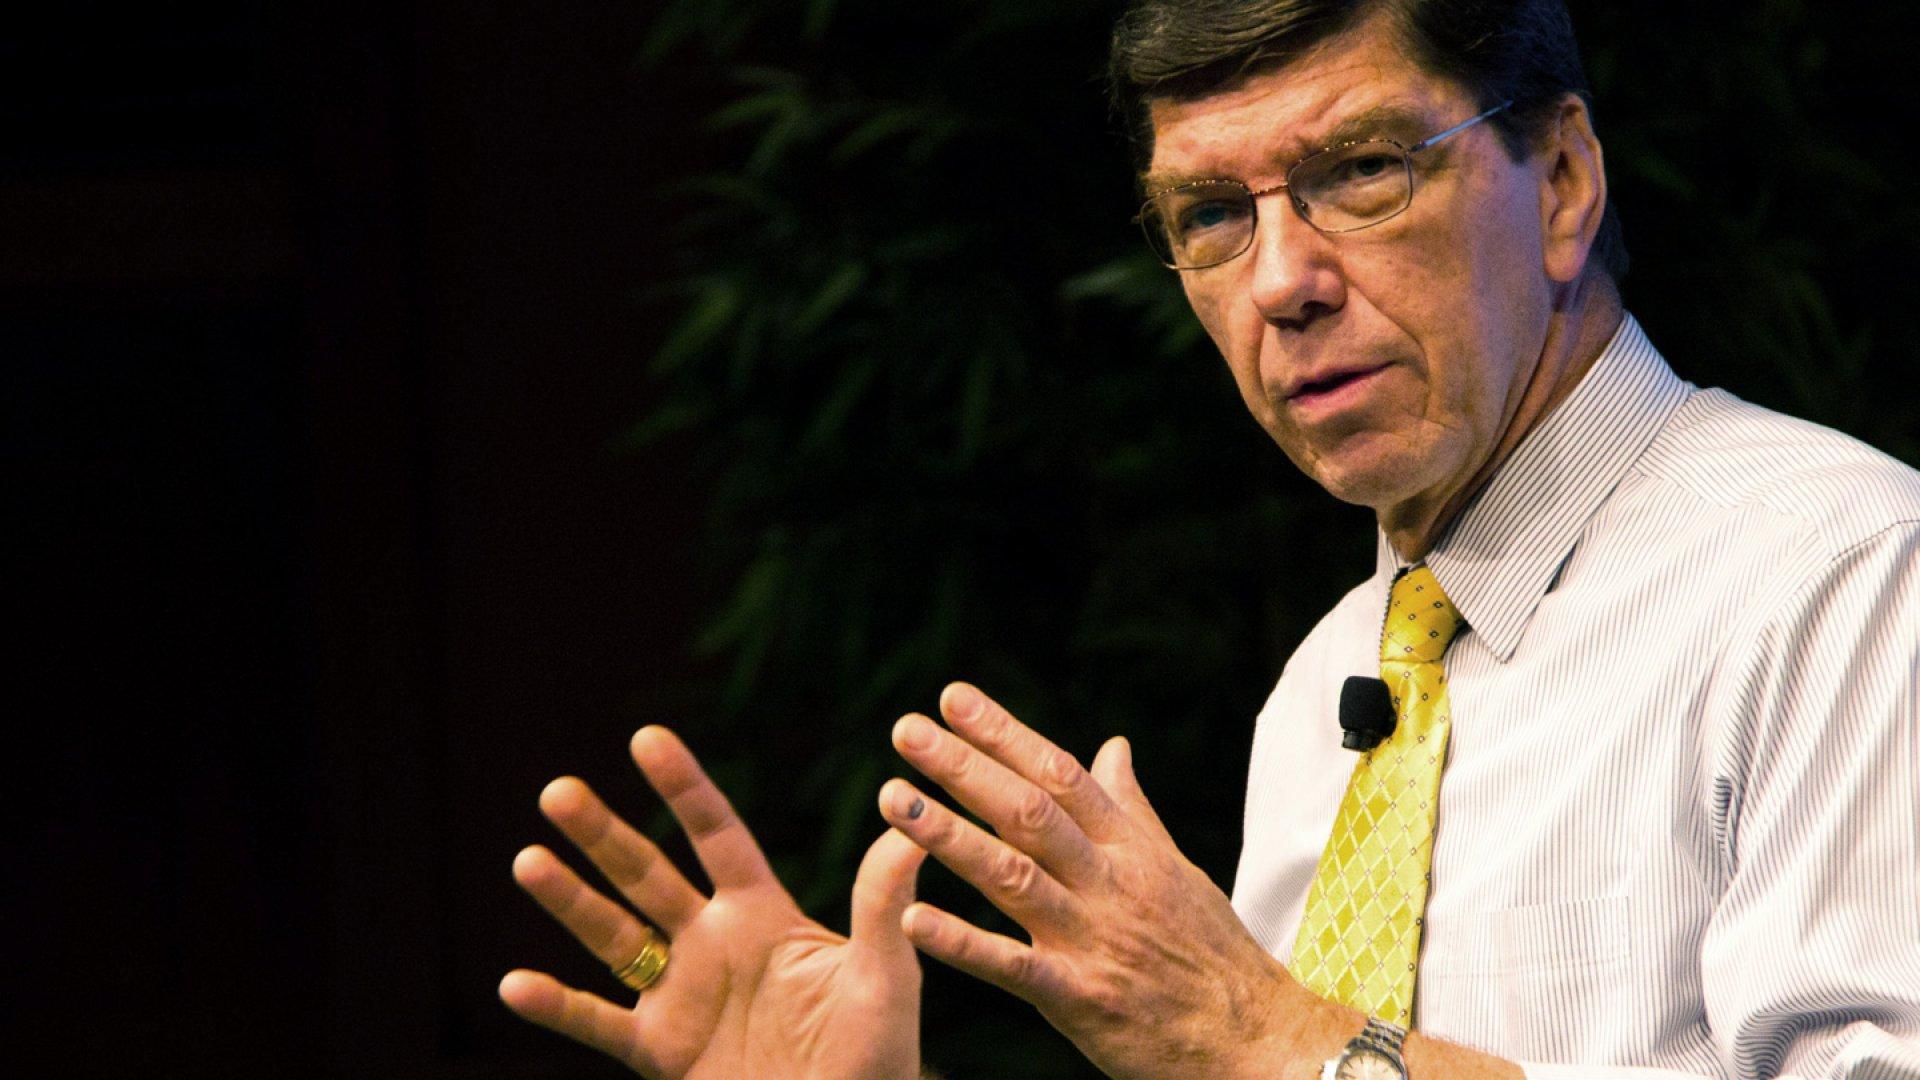 Clayton Christensen, Professor of Business Administration at Harvard Business School.